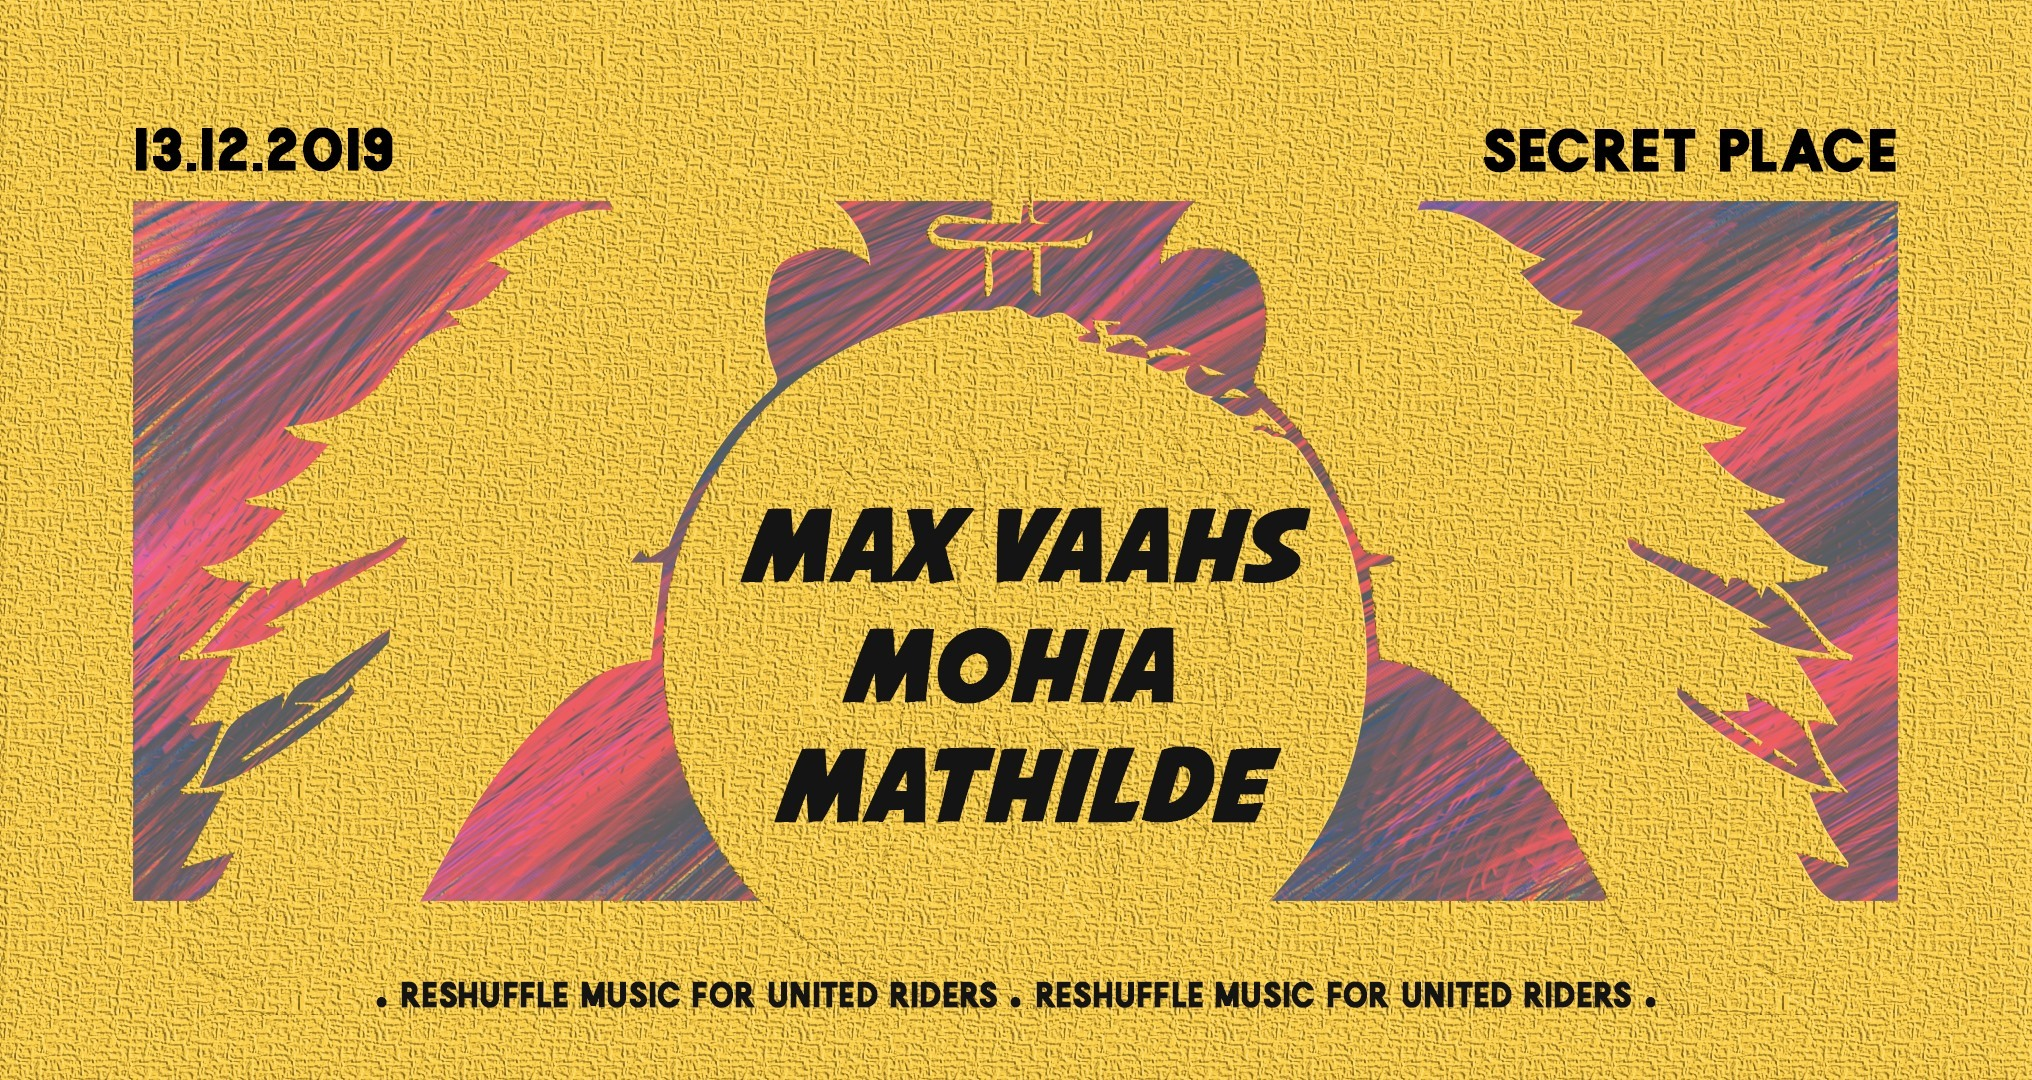 Reshuffle Music invite Max Vaahs, Mathilde & Mohia